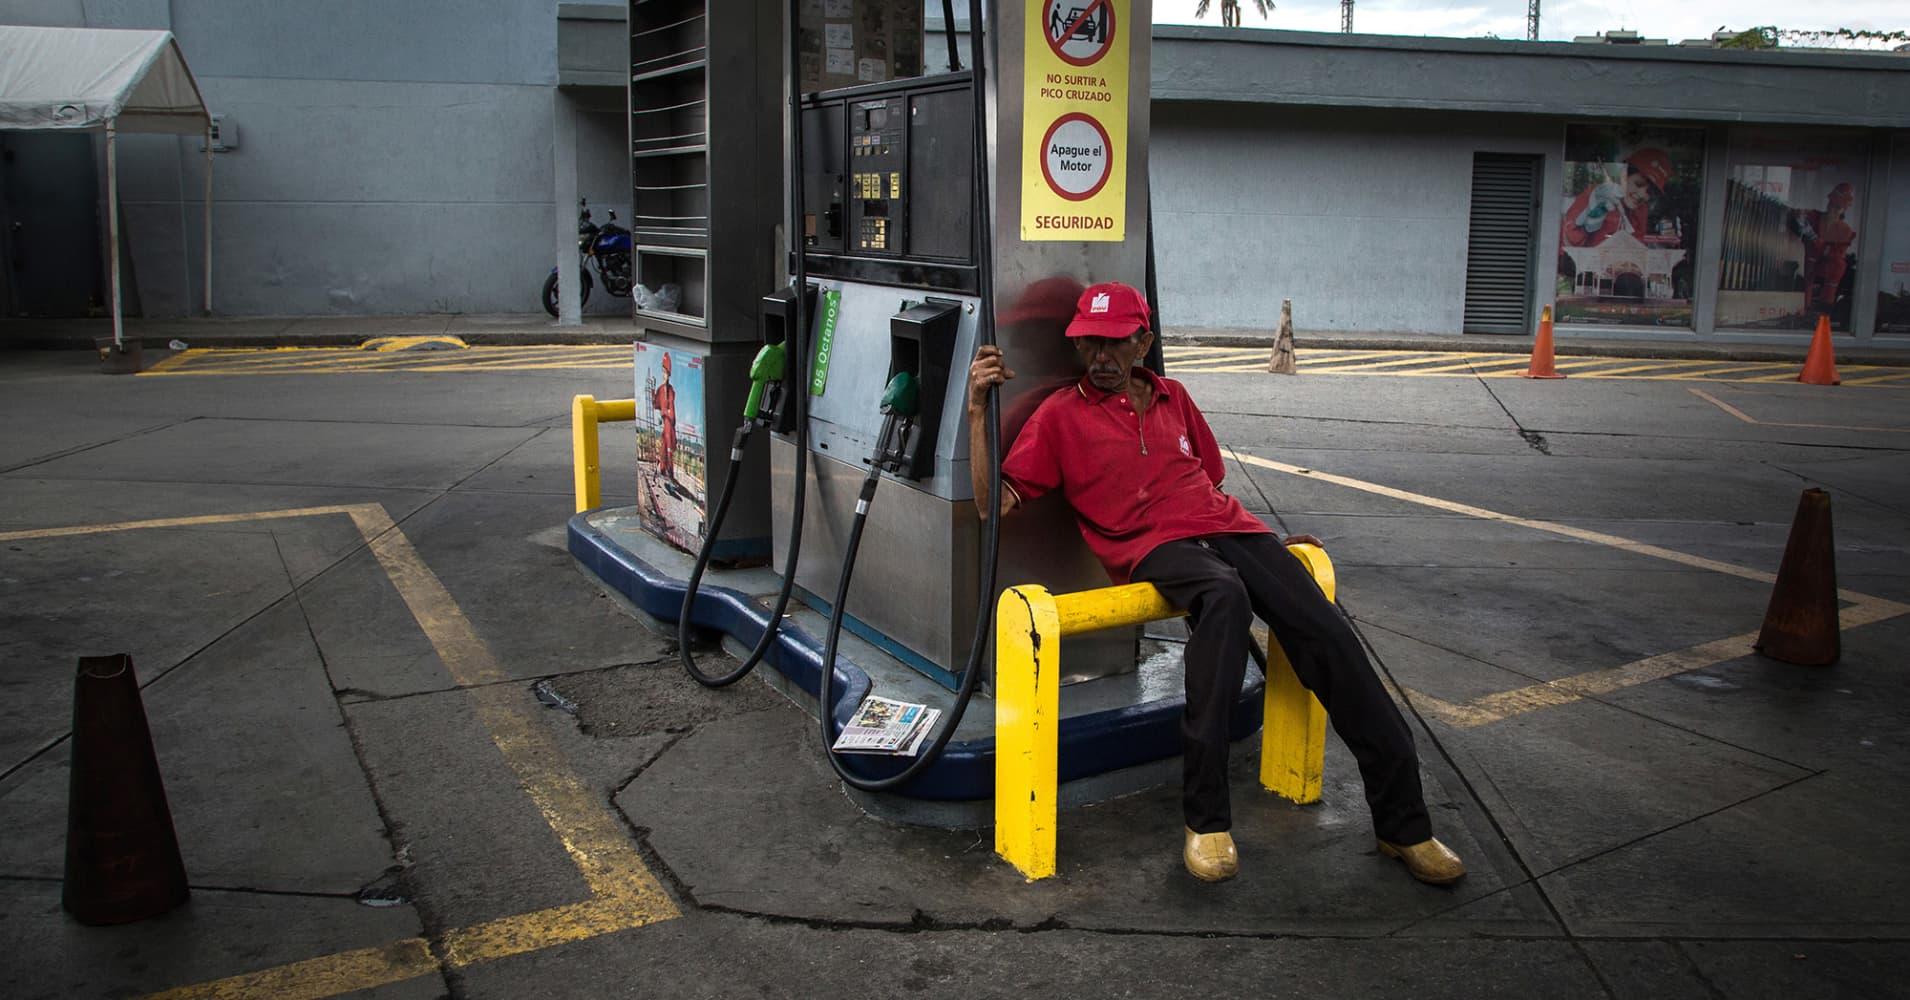 Break in US-Venezuela relations raises fresh concerns for oil market and OPEC